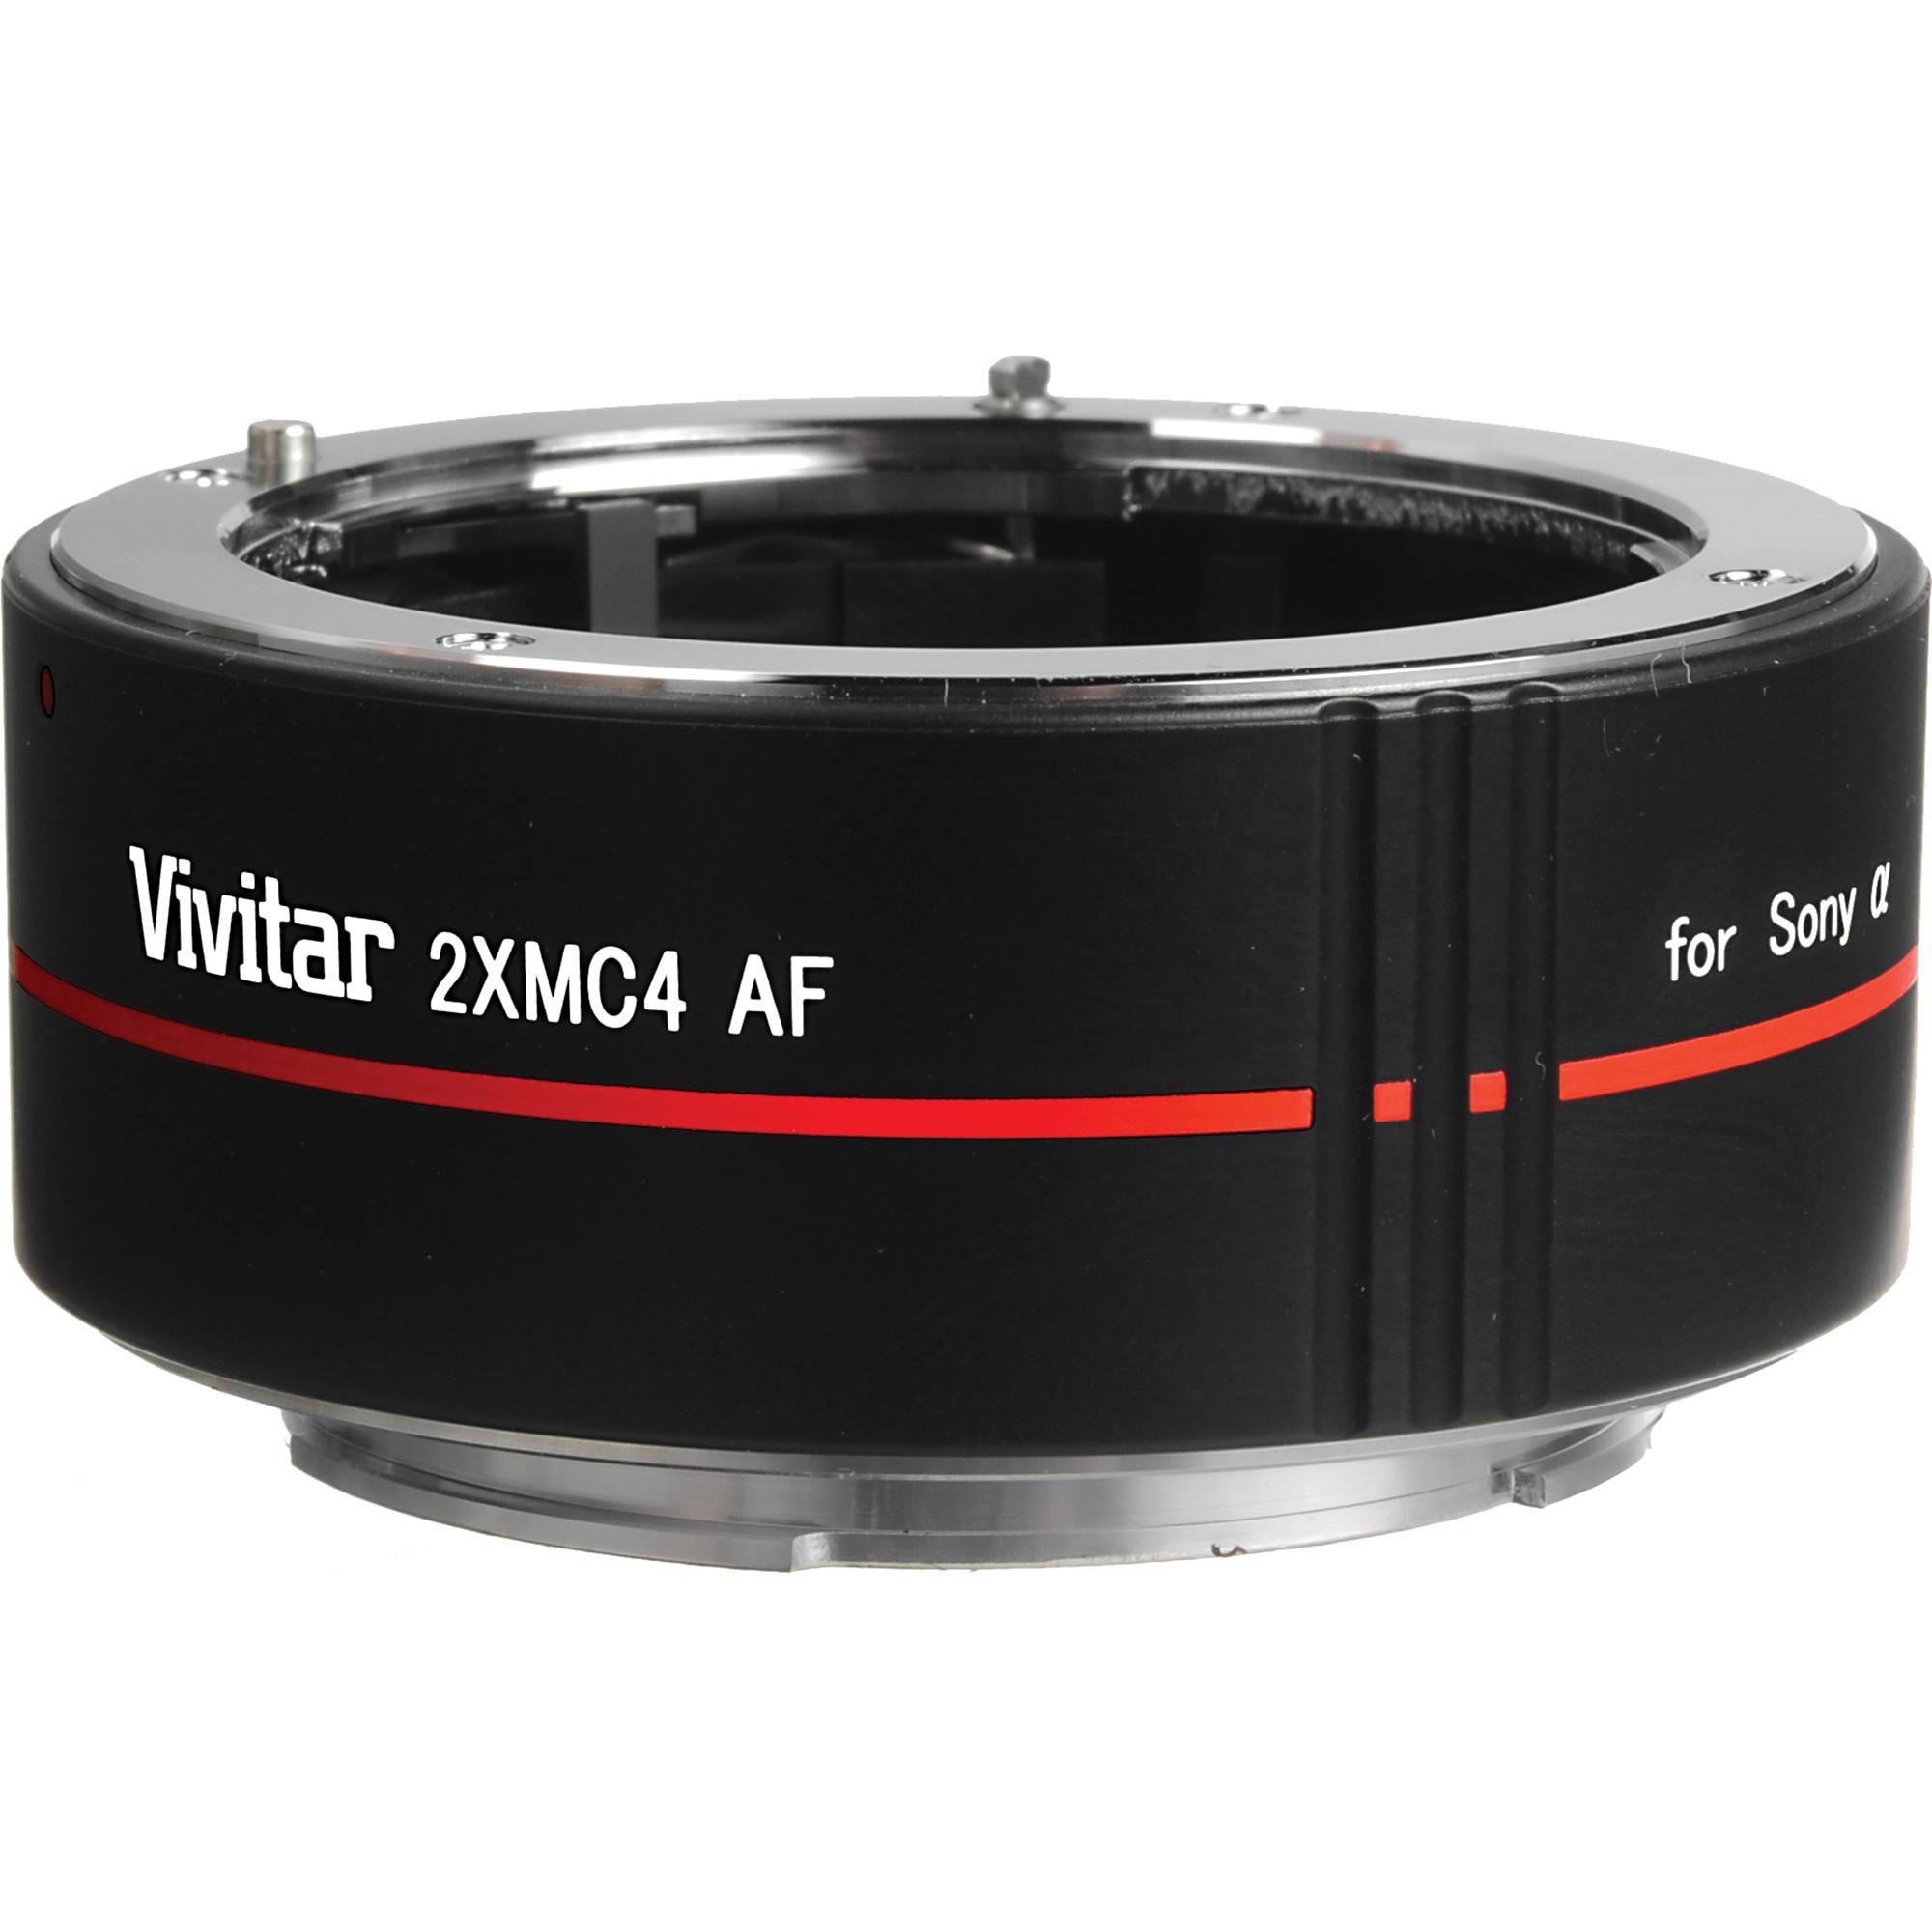 Sony A33 Manual Pdf Suzuki Gsf1200s 1996 8211 1999 Electrical Wiring Diagram Vivitar Series 1 Teleconverter For Minolta